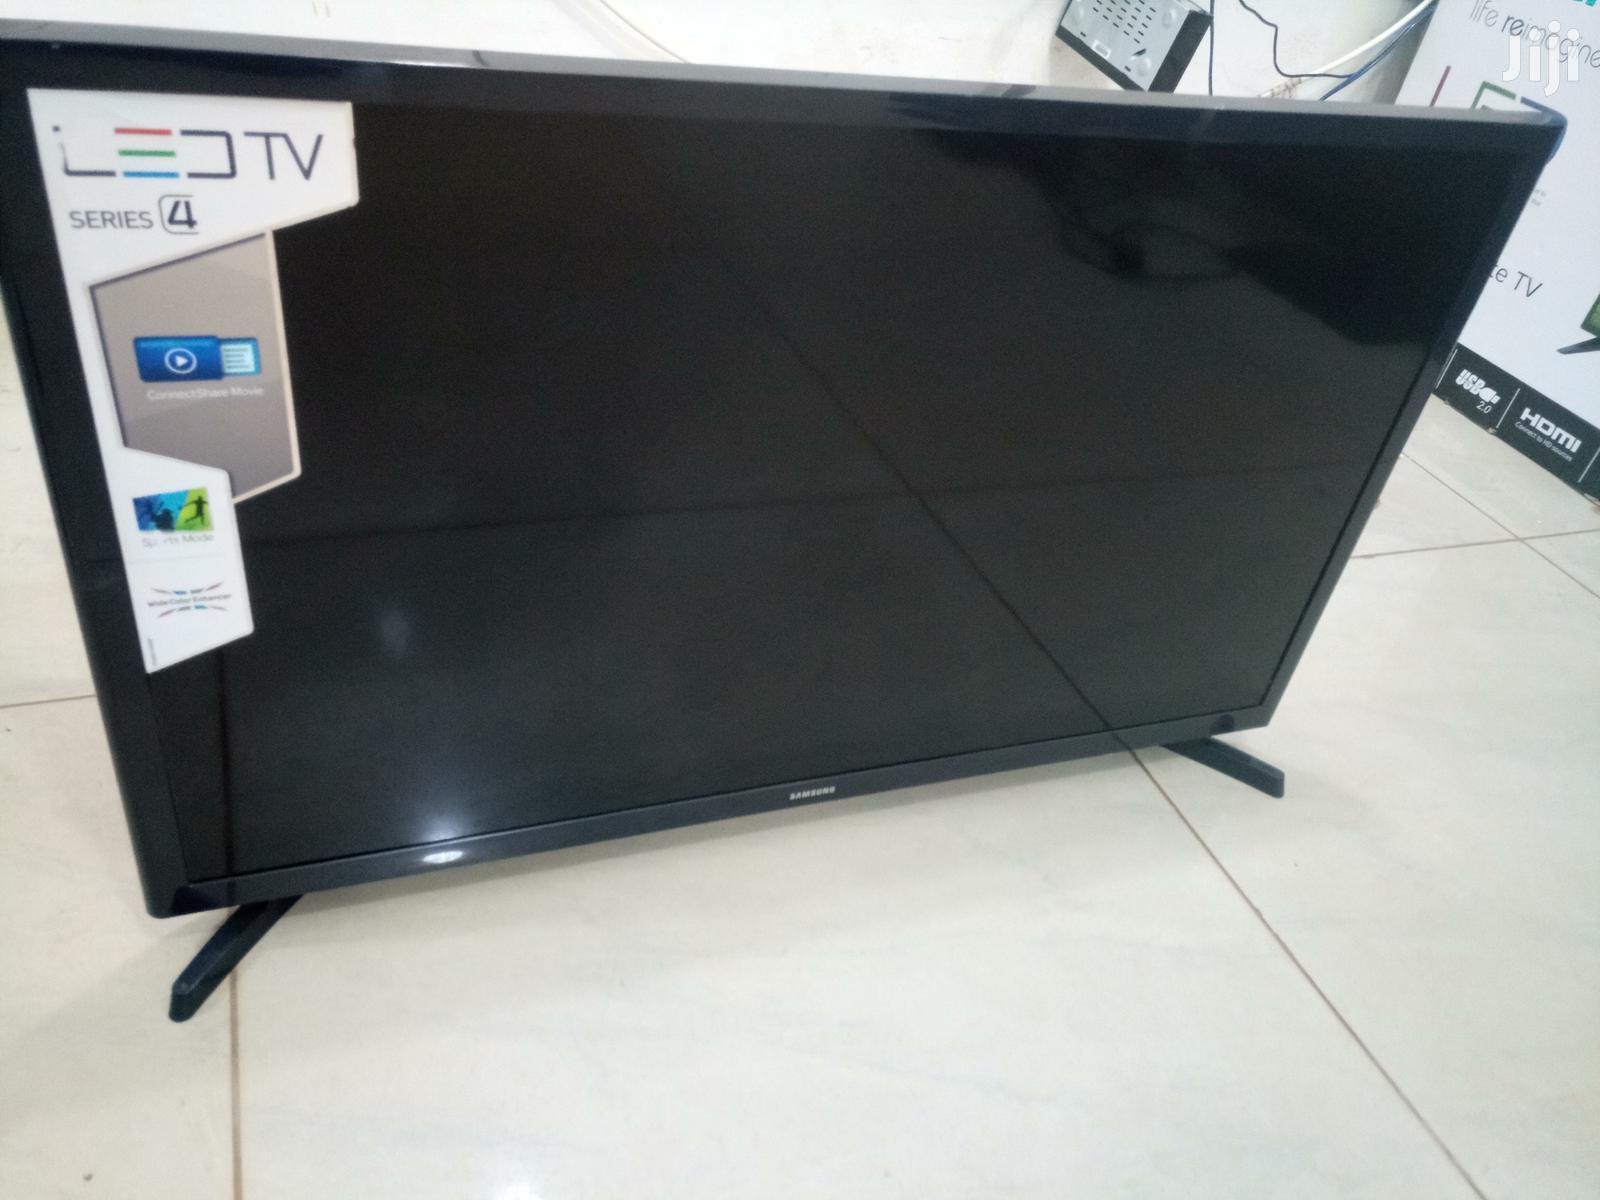 Samsung Flat Screen Digital TV 32 Inches